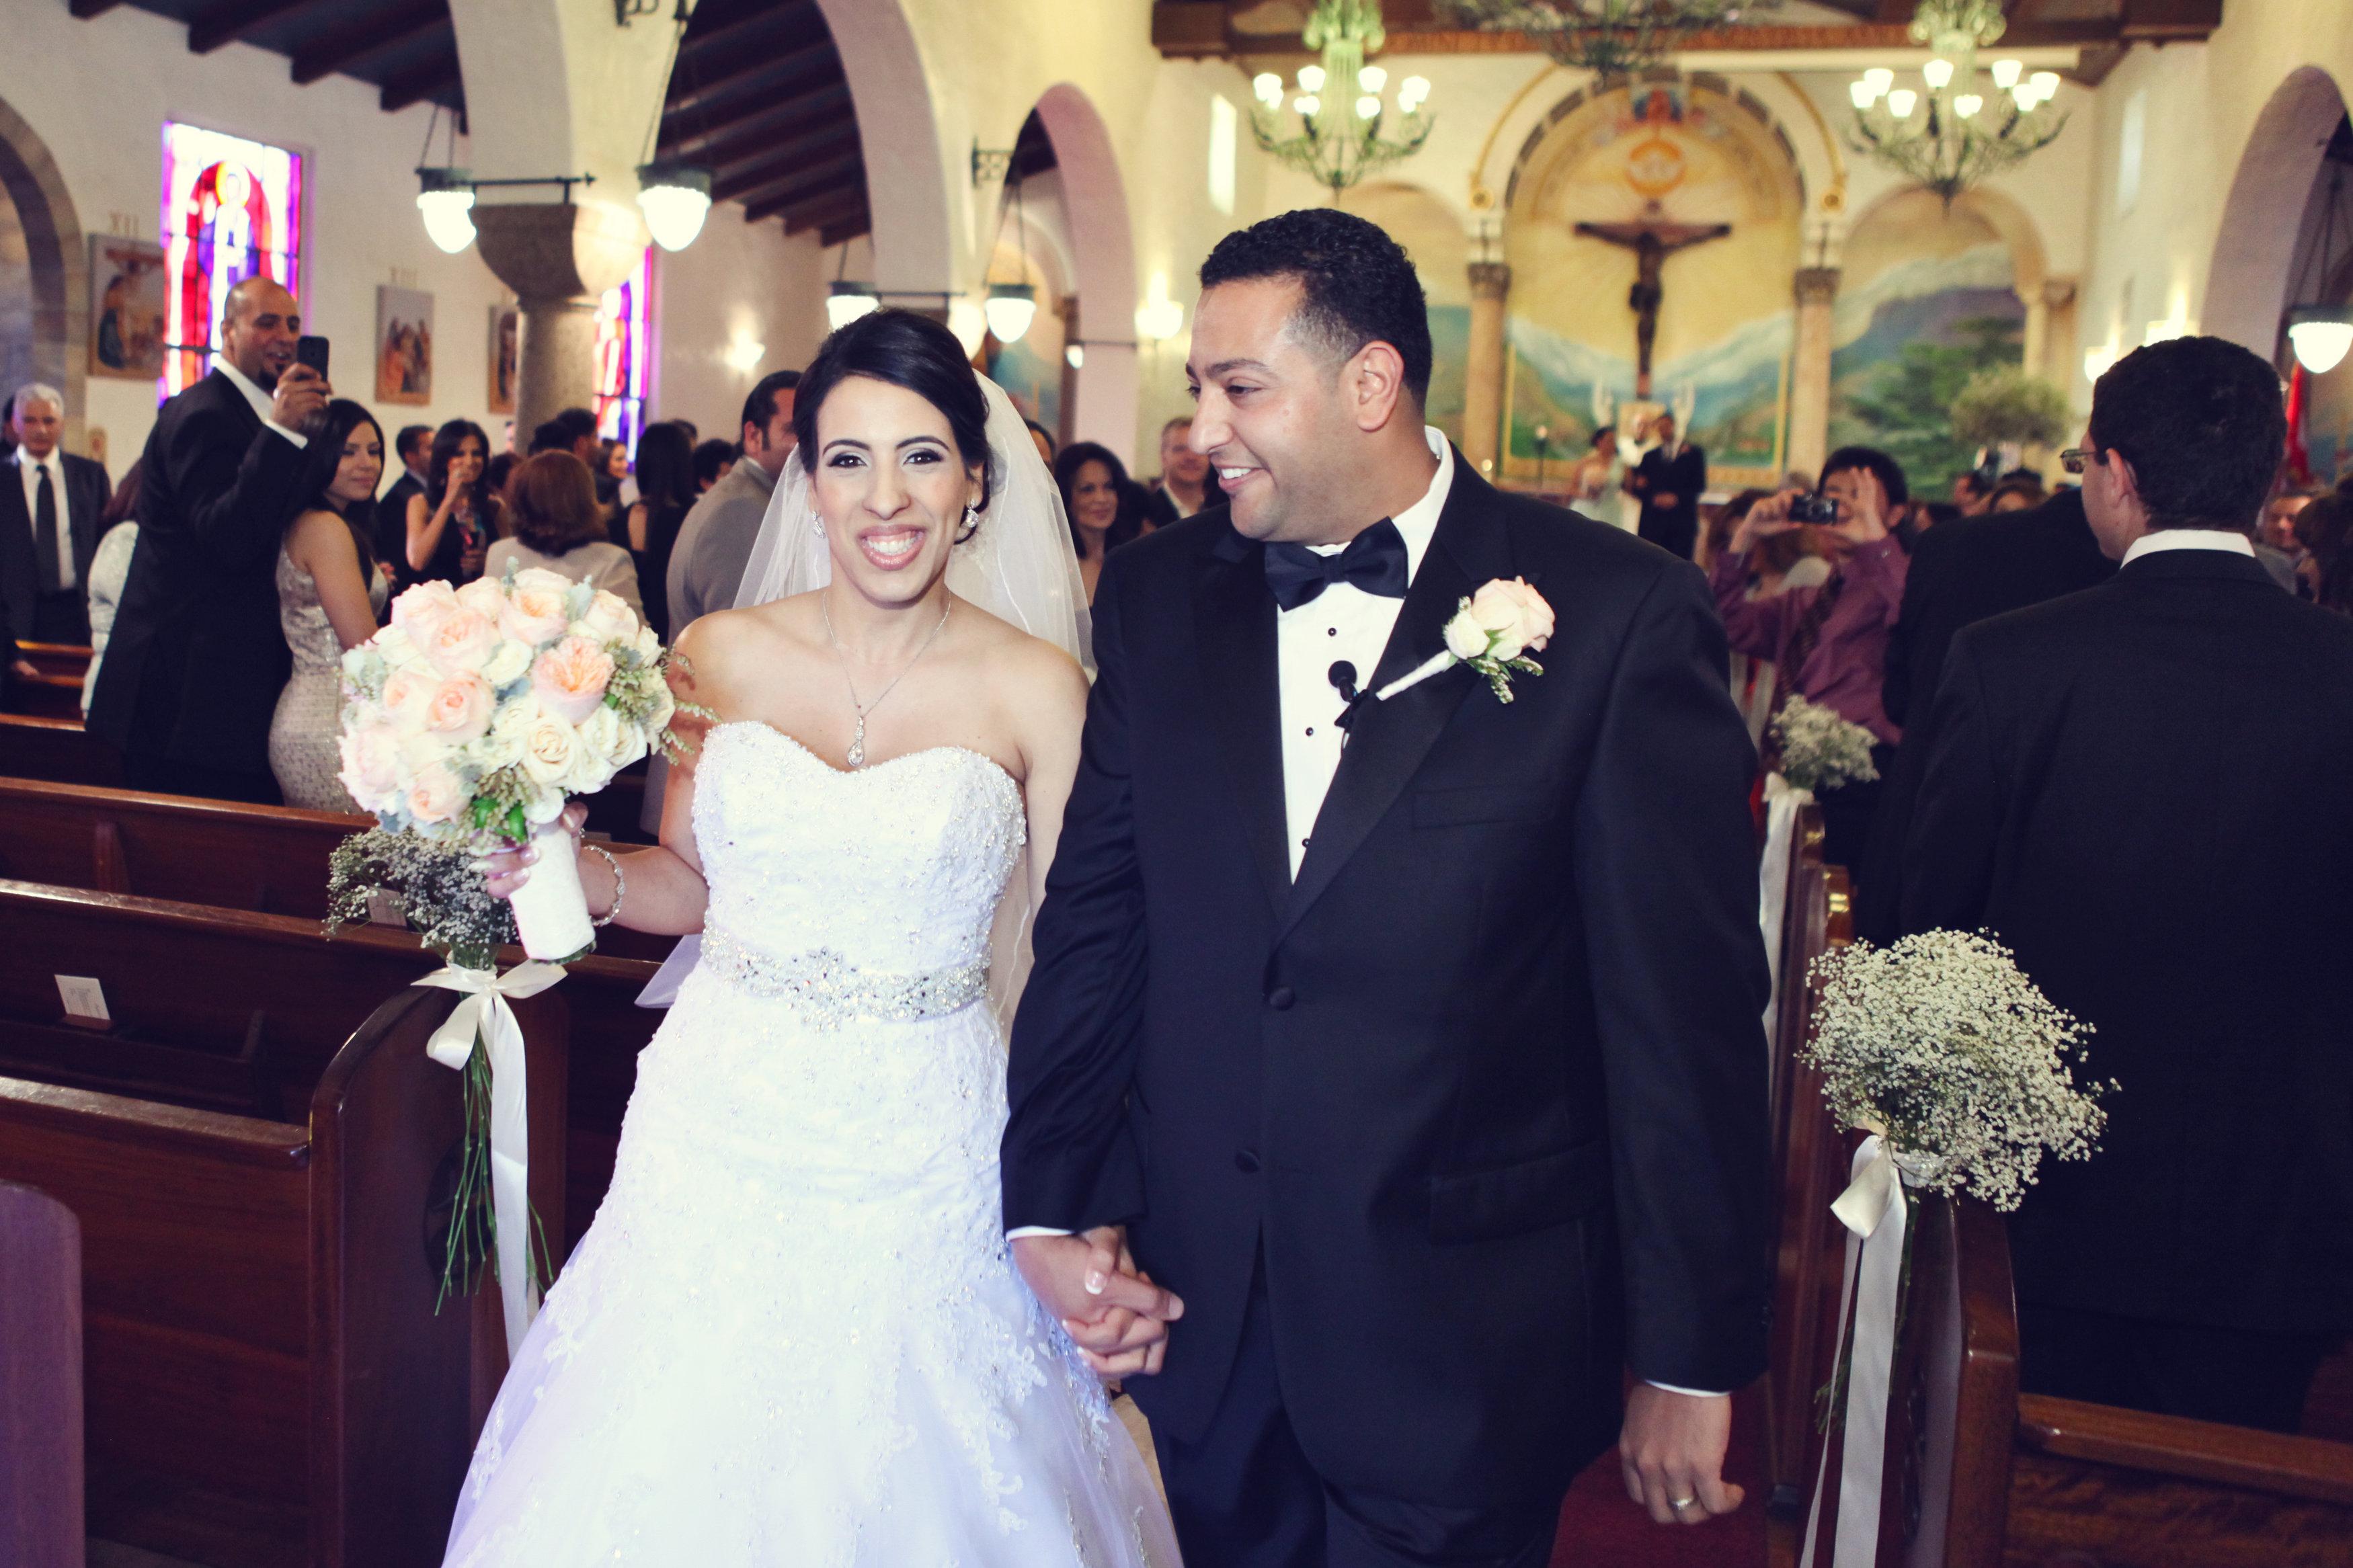 Wedding Brandview Ballroom in Glendale  DJ Service Wedding Entertainment Event Lighting Planning